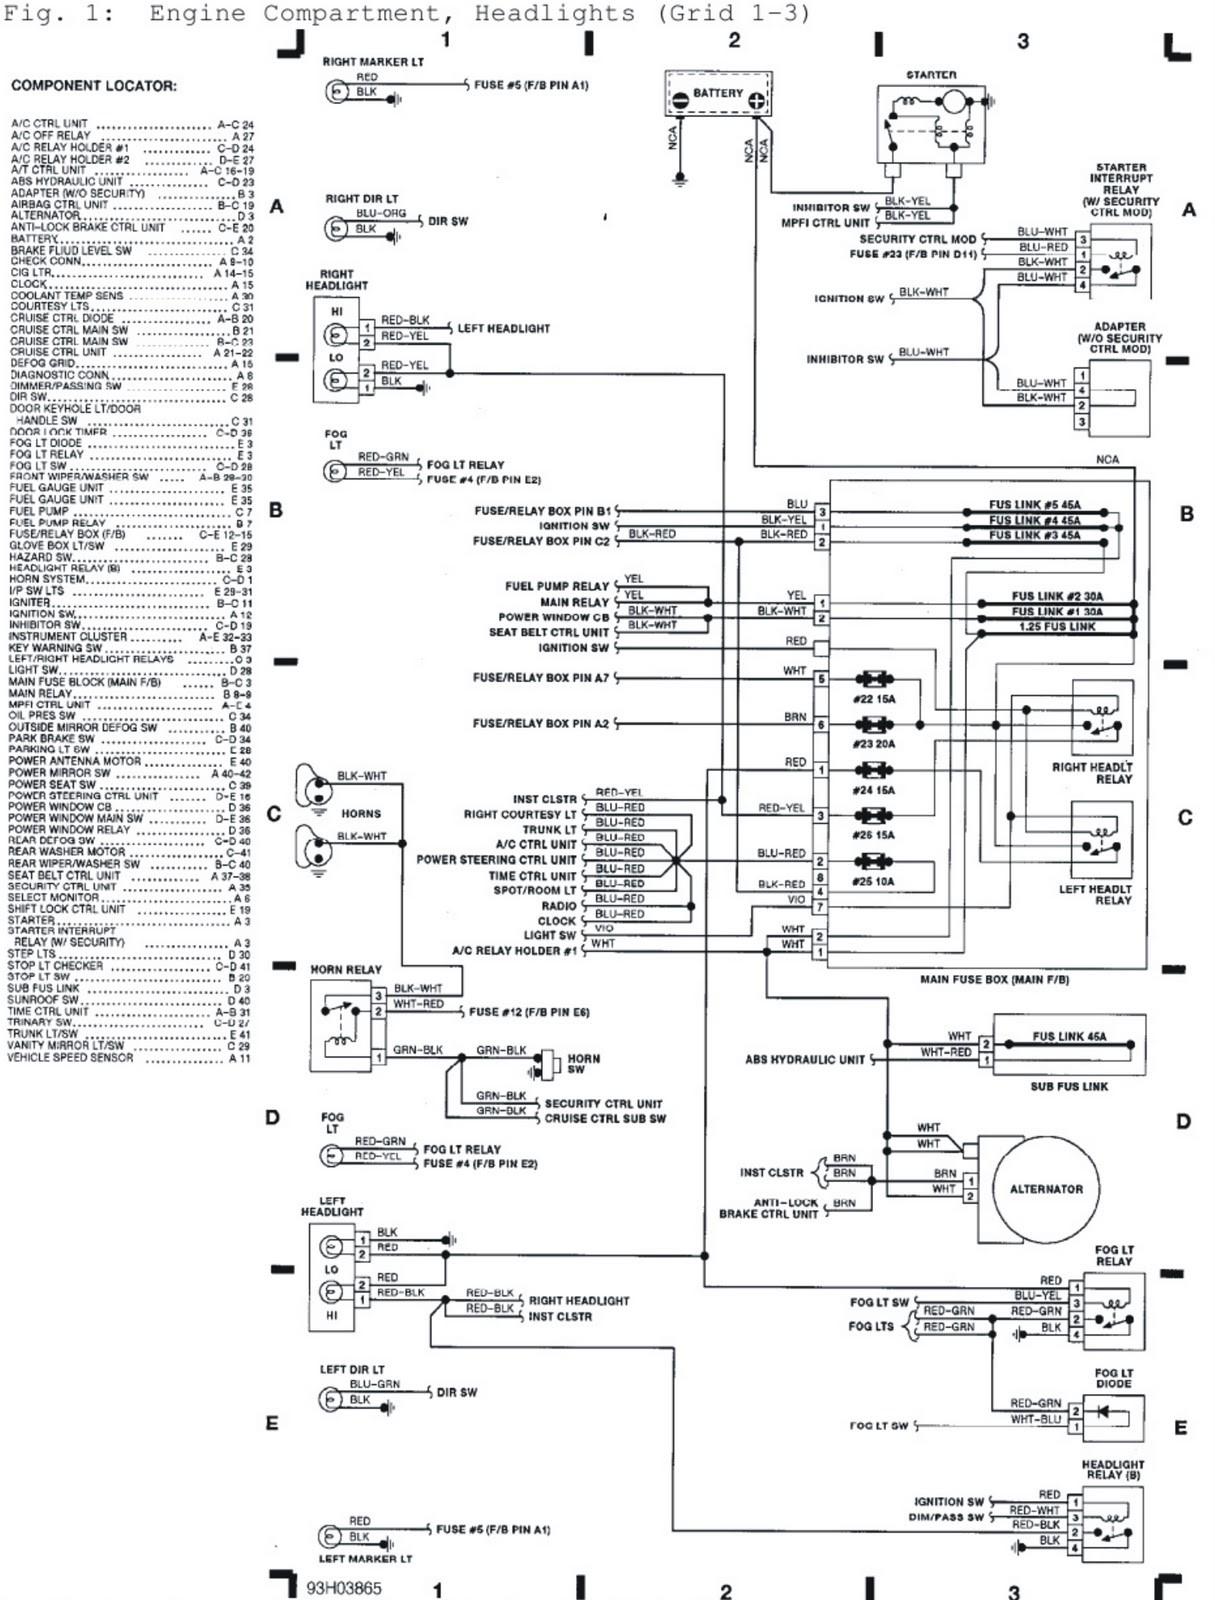 hight resolution of 1997 subaru legacy engine diagram diagram subaru legacy engine diagram of 1997 subaru legacy engine diagram